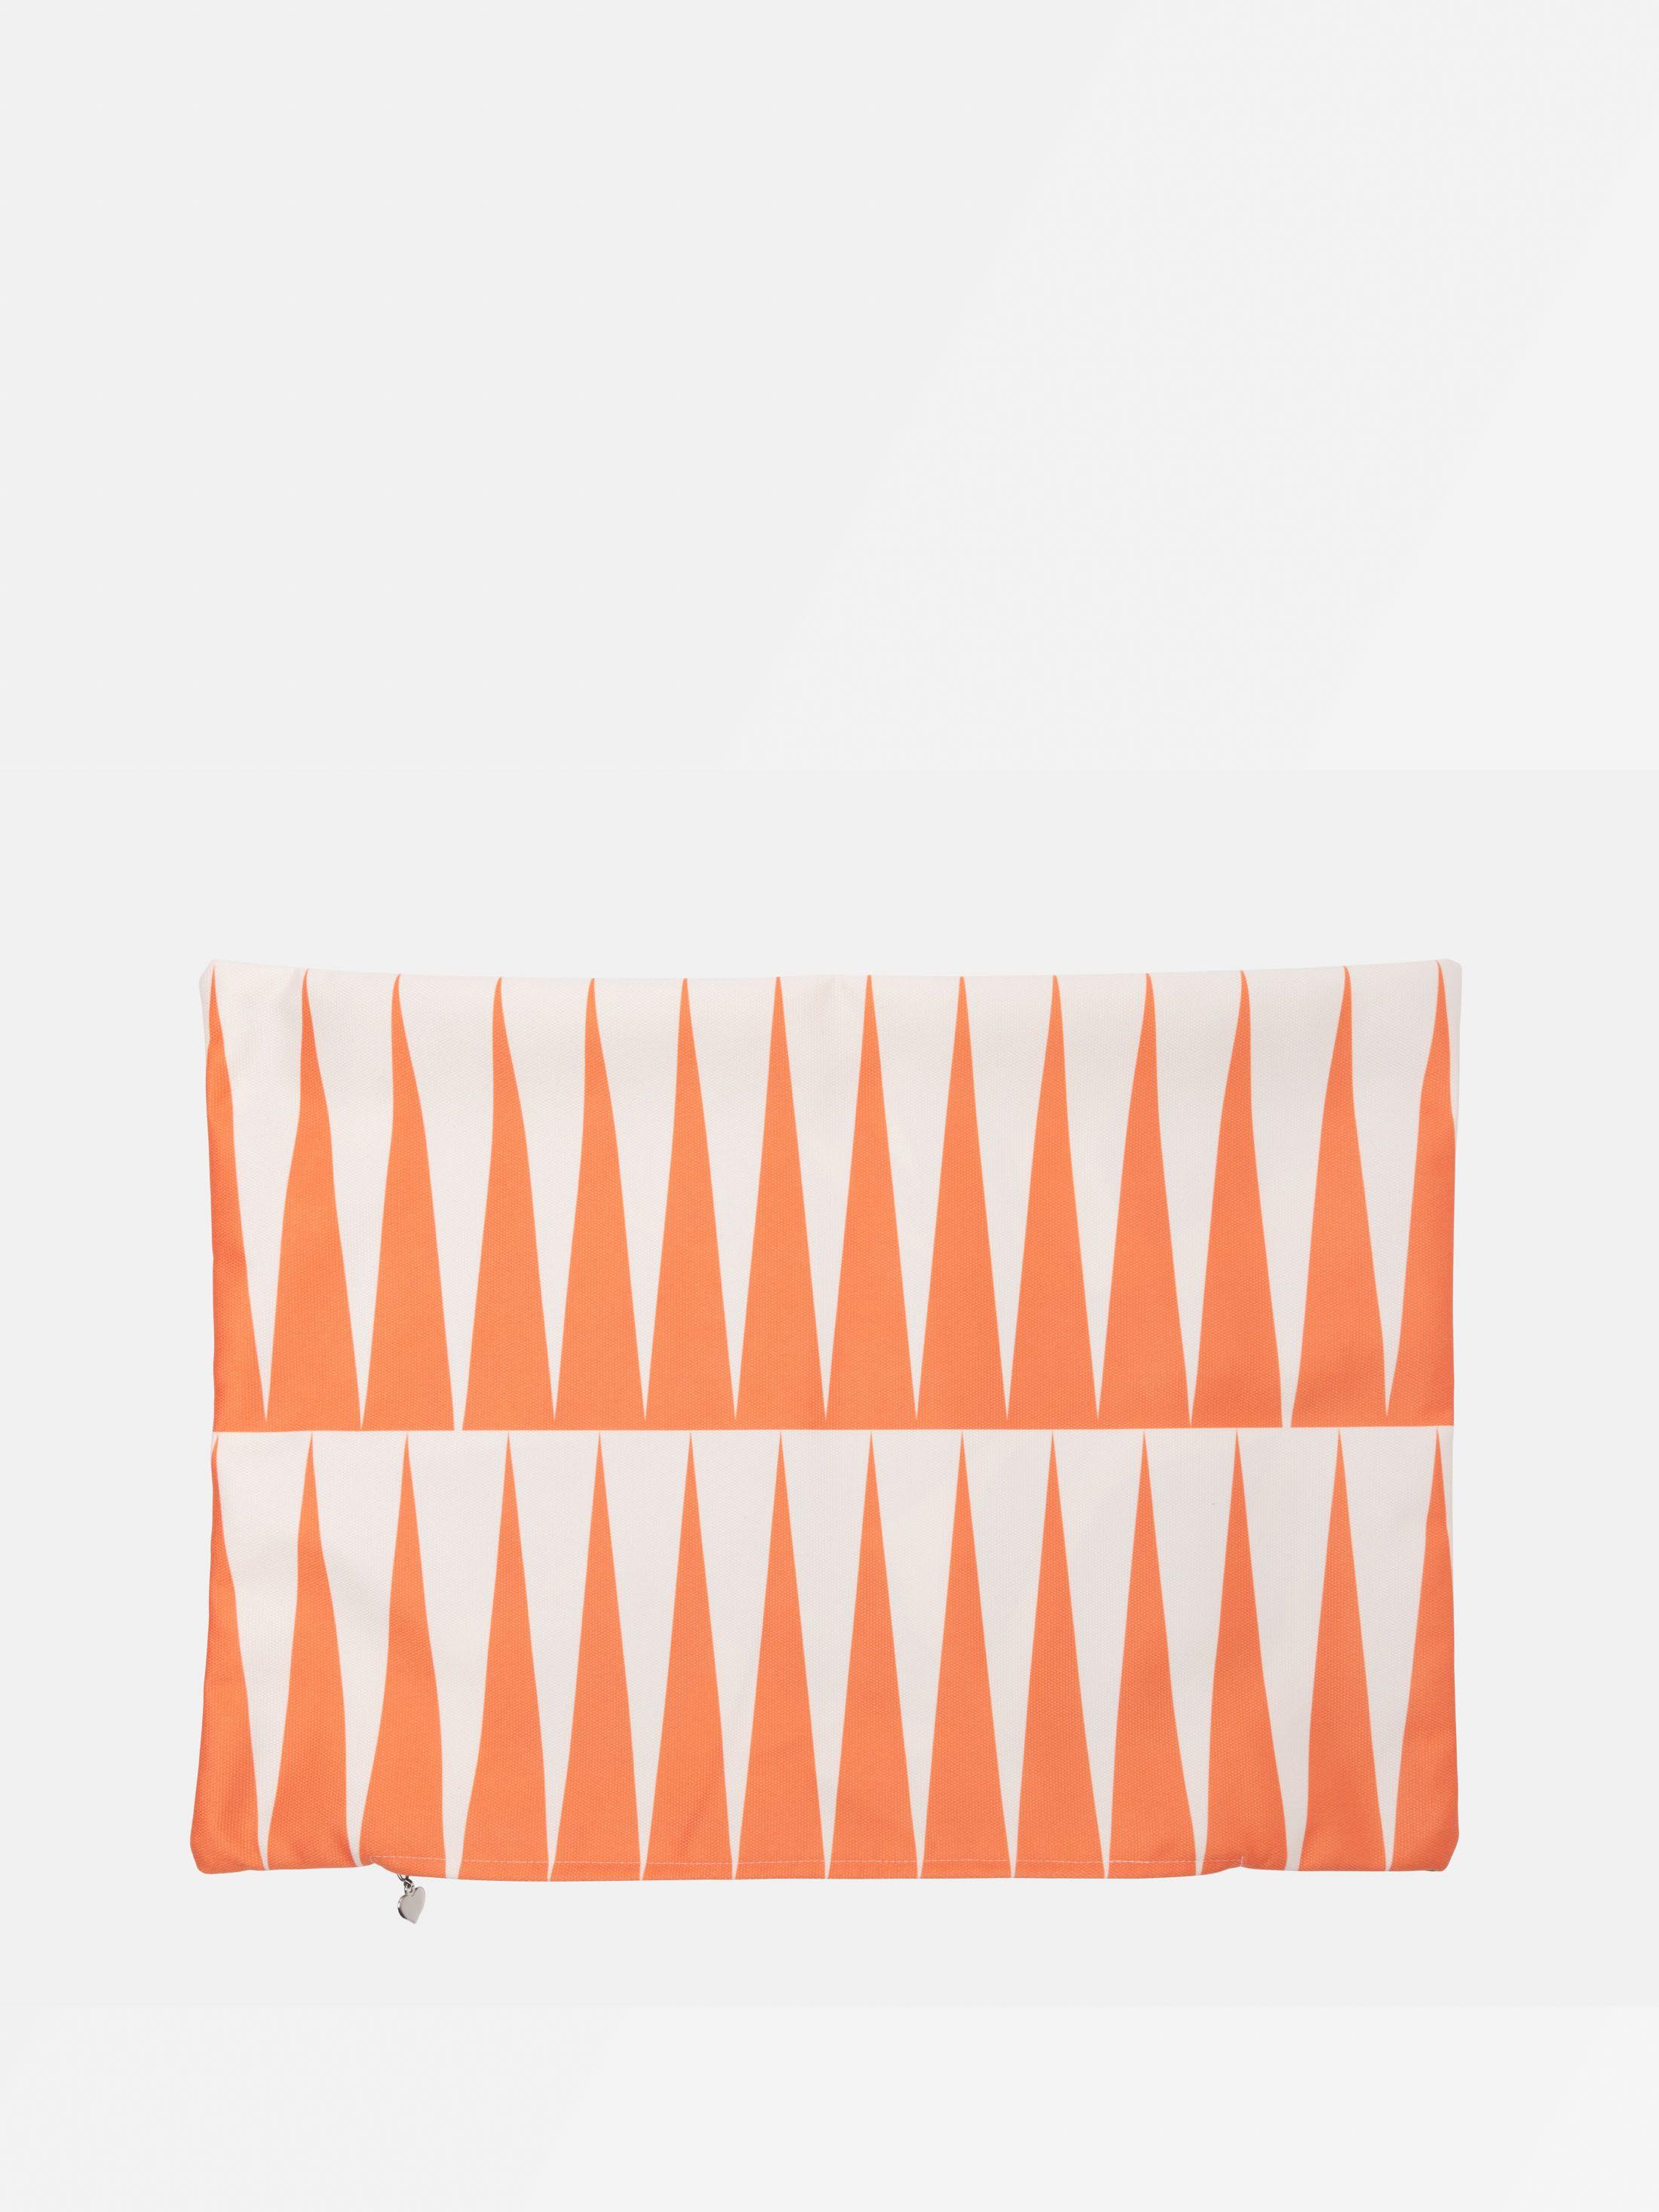 custom cushion cover details